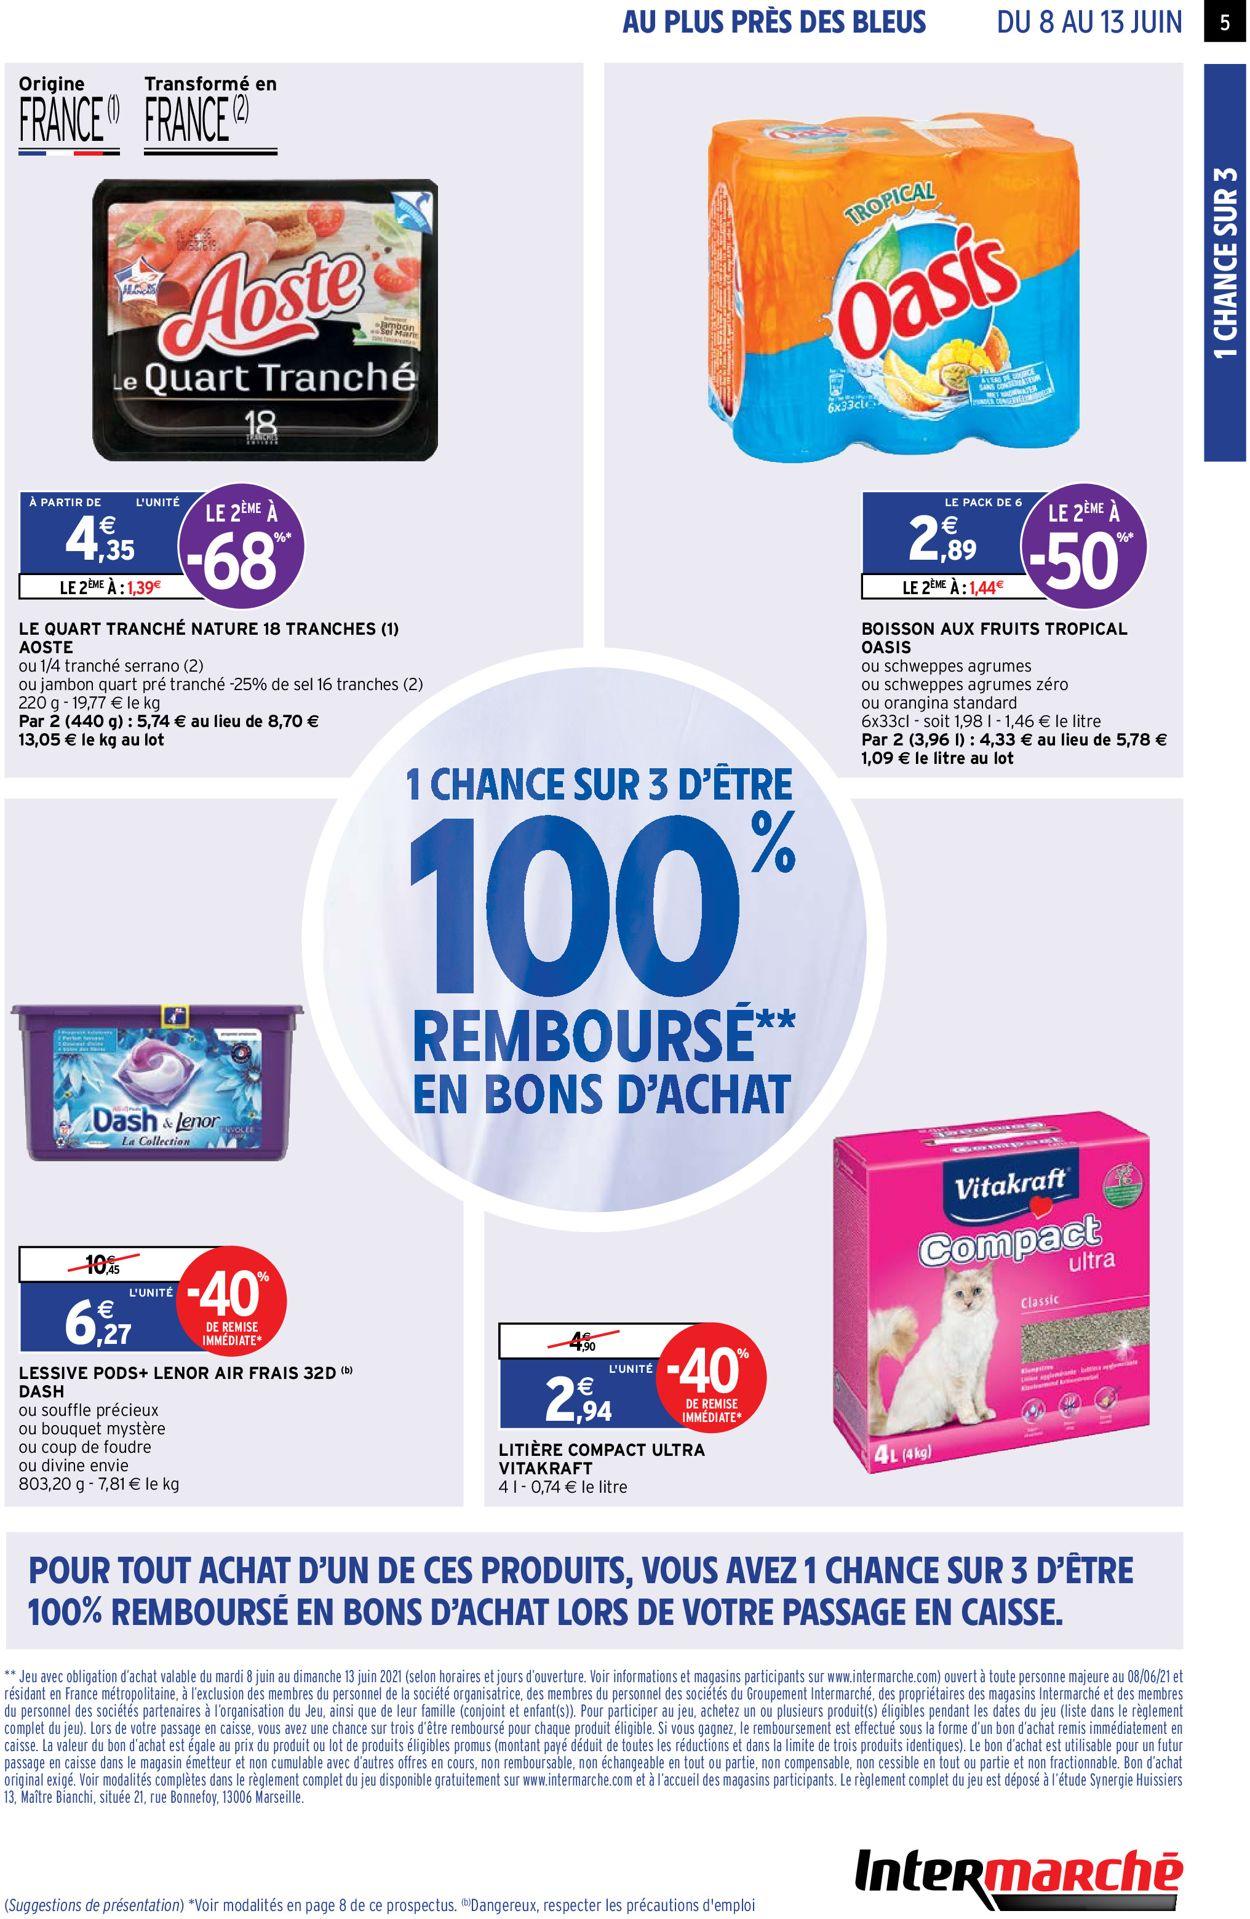 Intermarché Catalogue - 08.06-13.06.2021 (Page 5)